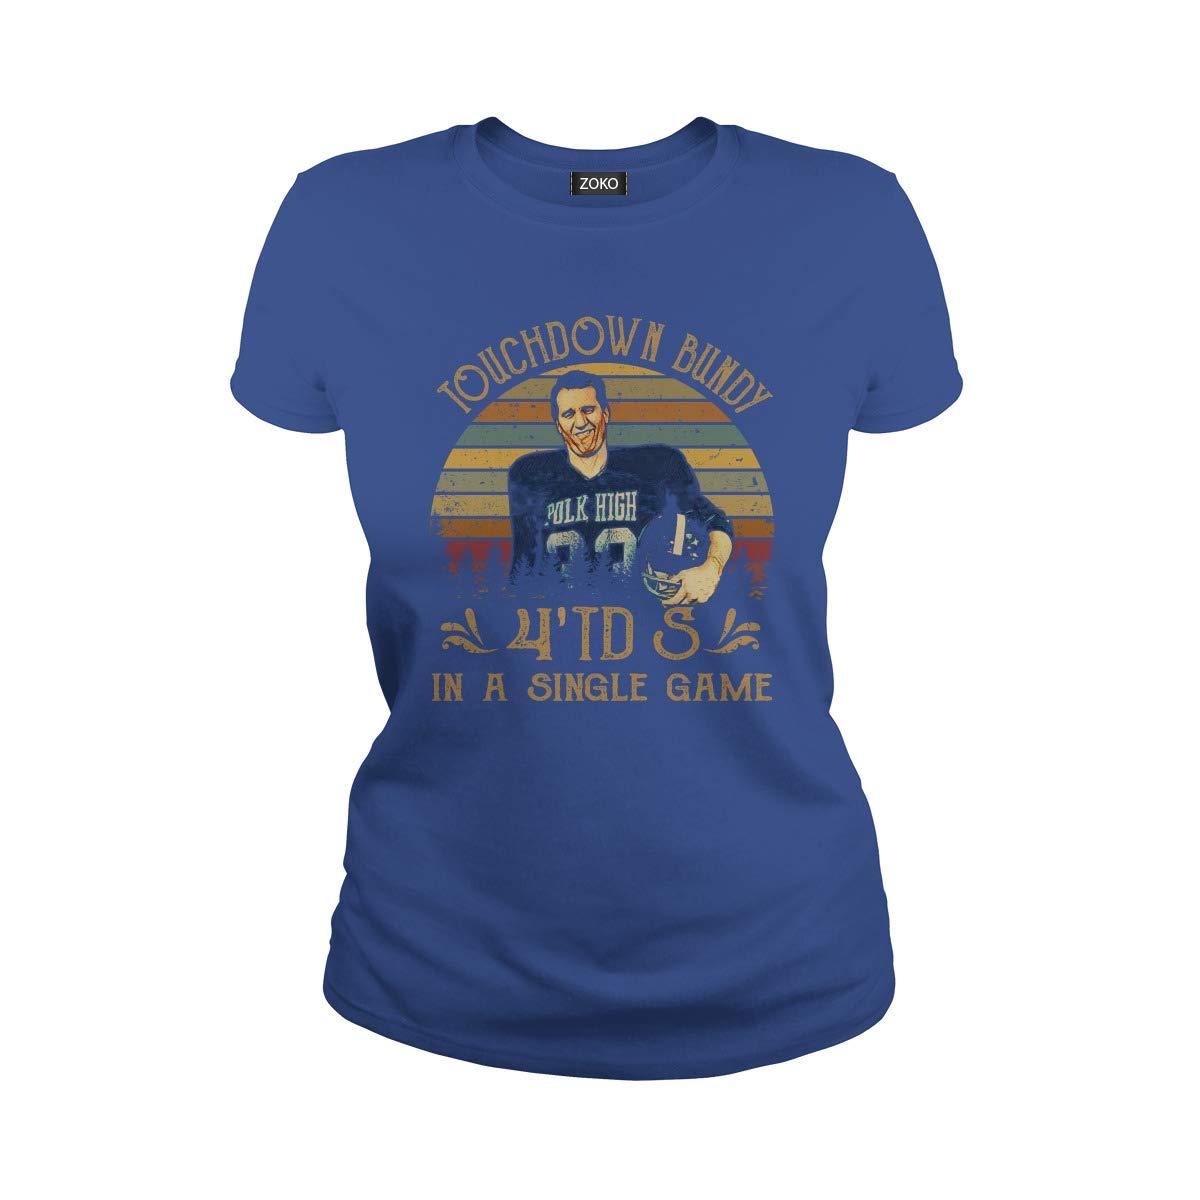 Touchdown Bundy 4TDs Vintage T-Shirt